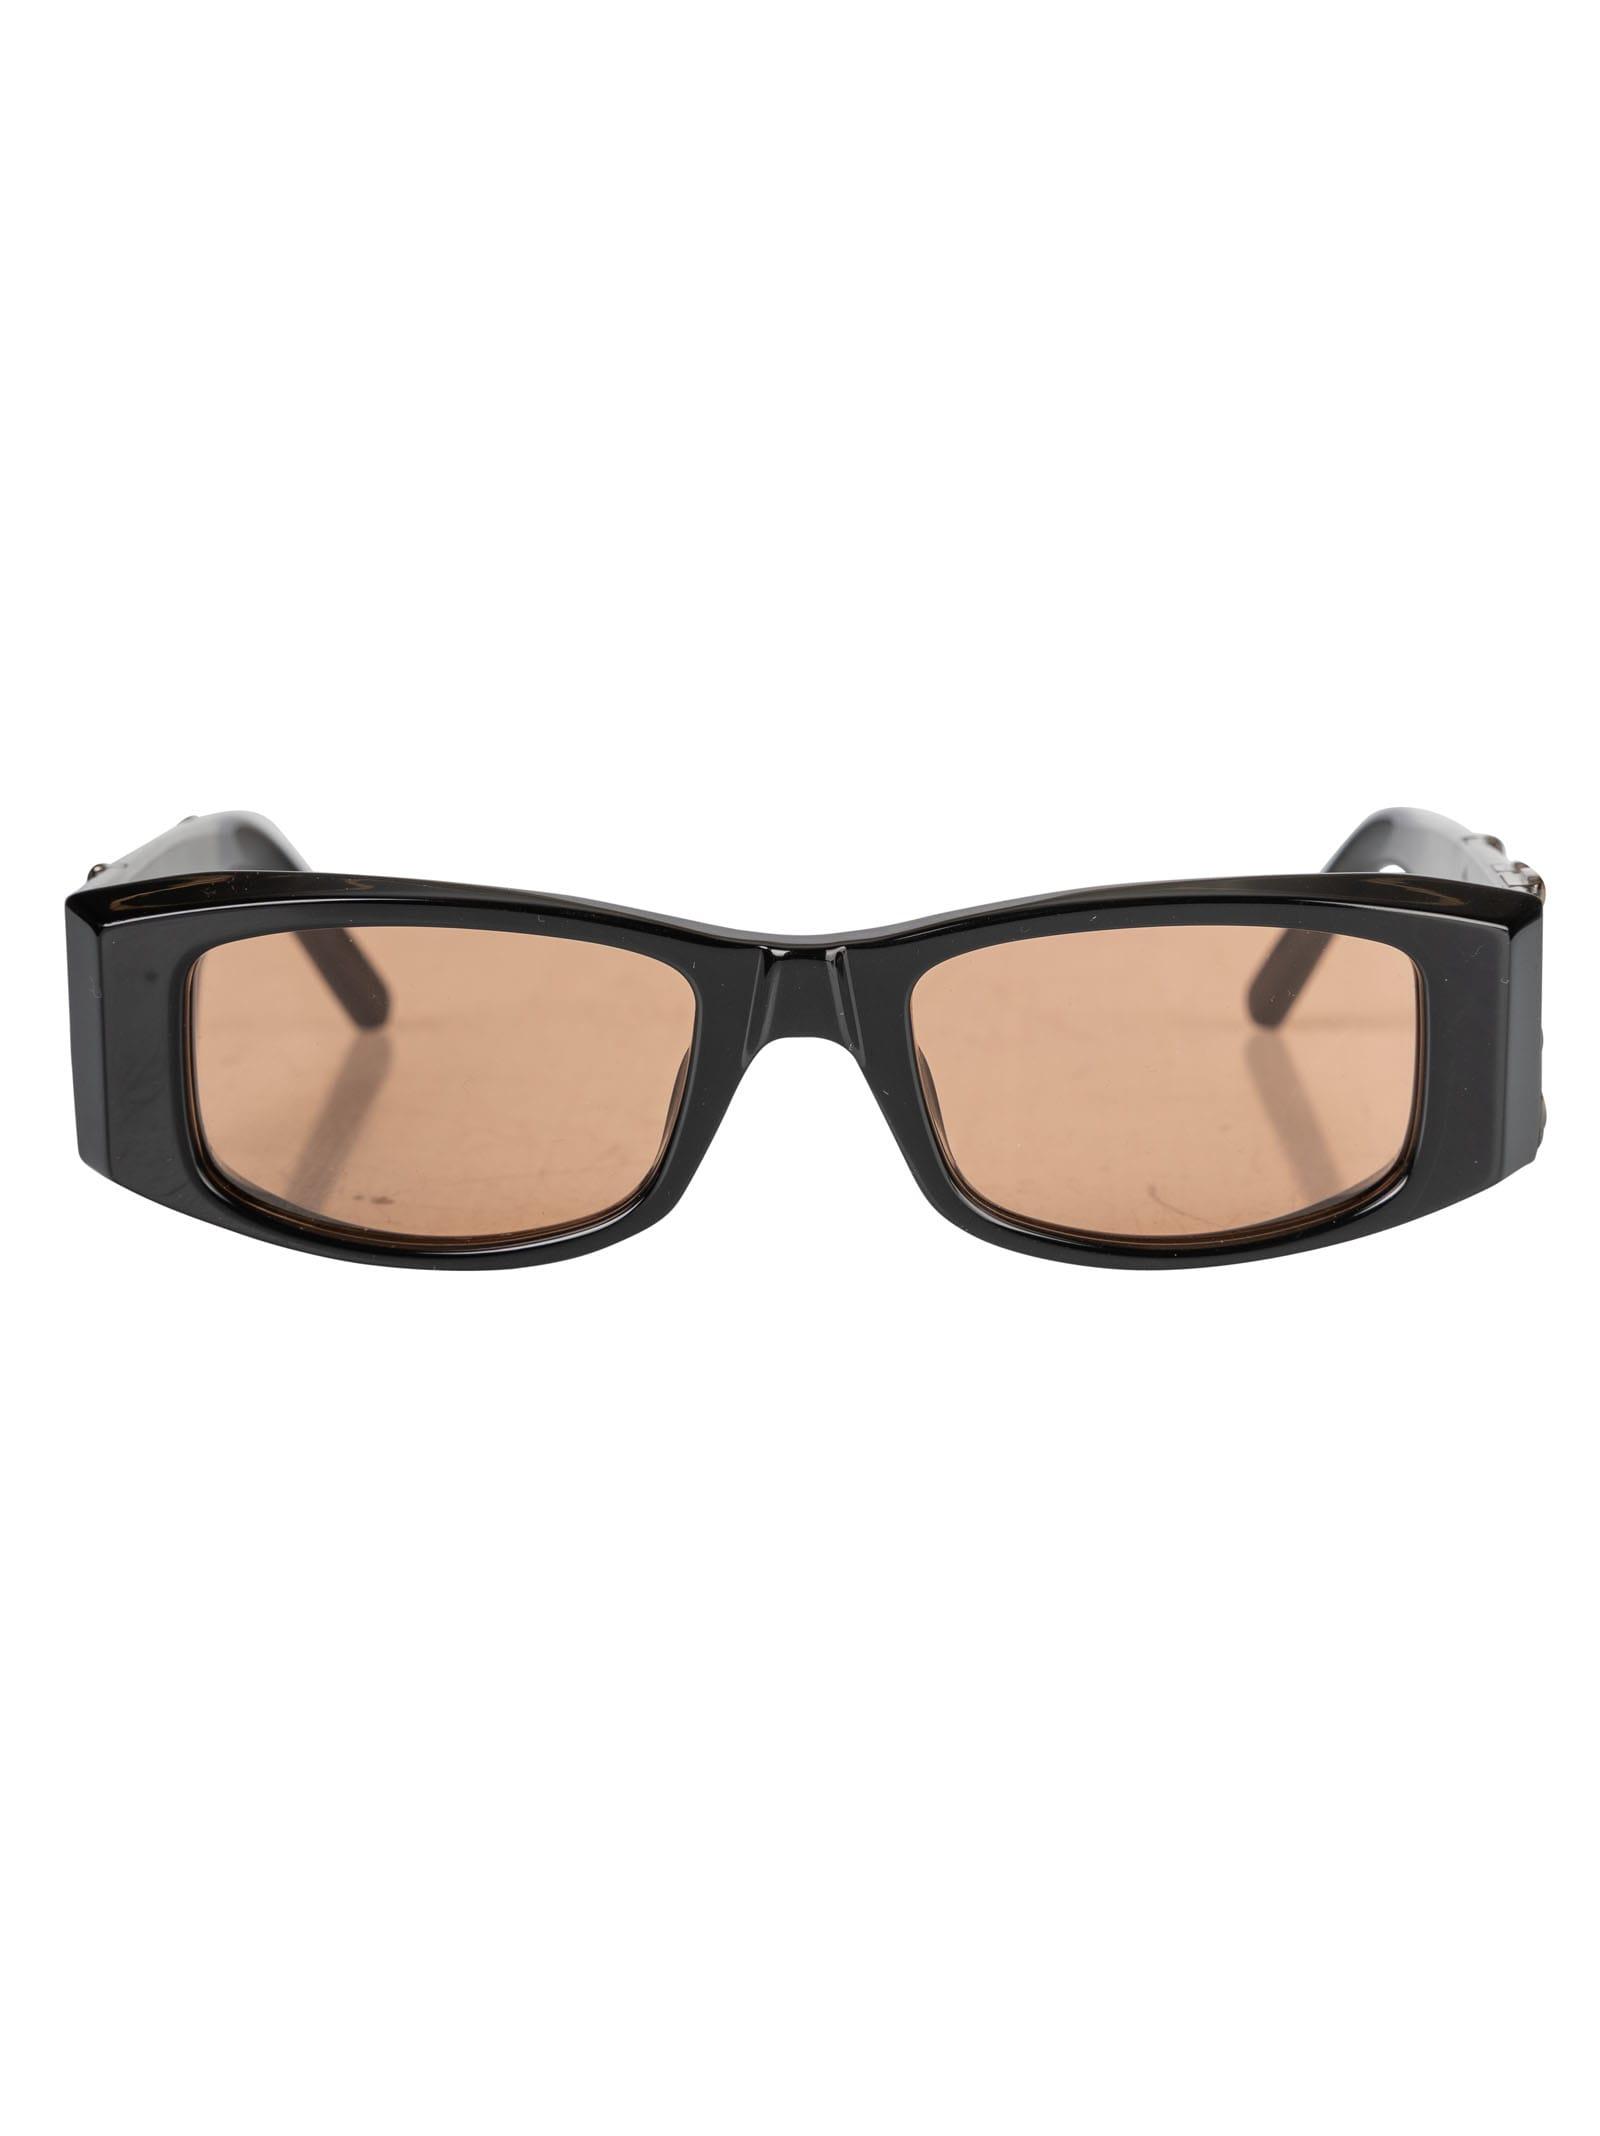 Palm Angels Pa01 Sunglasses In Black/orange